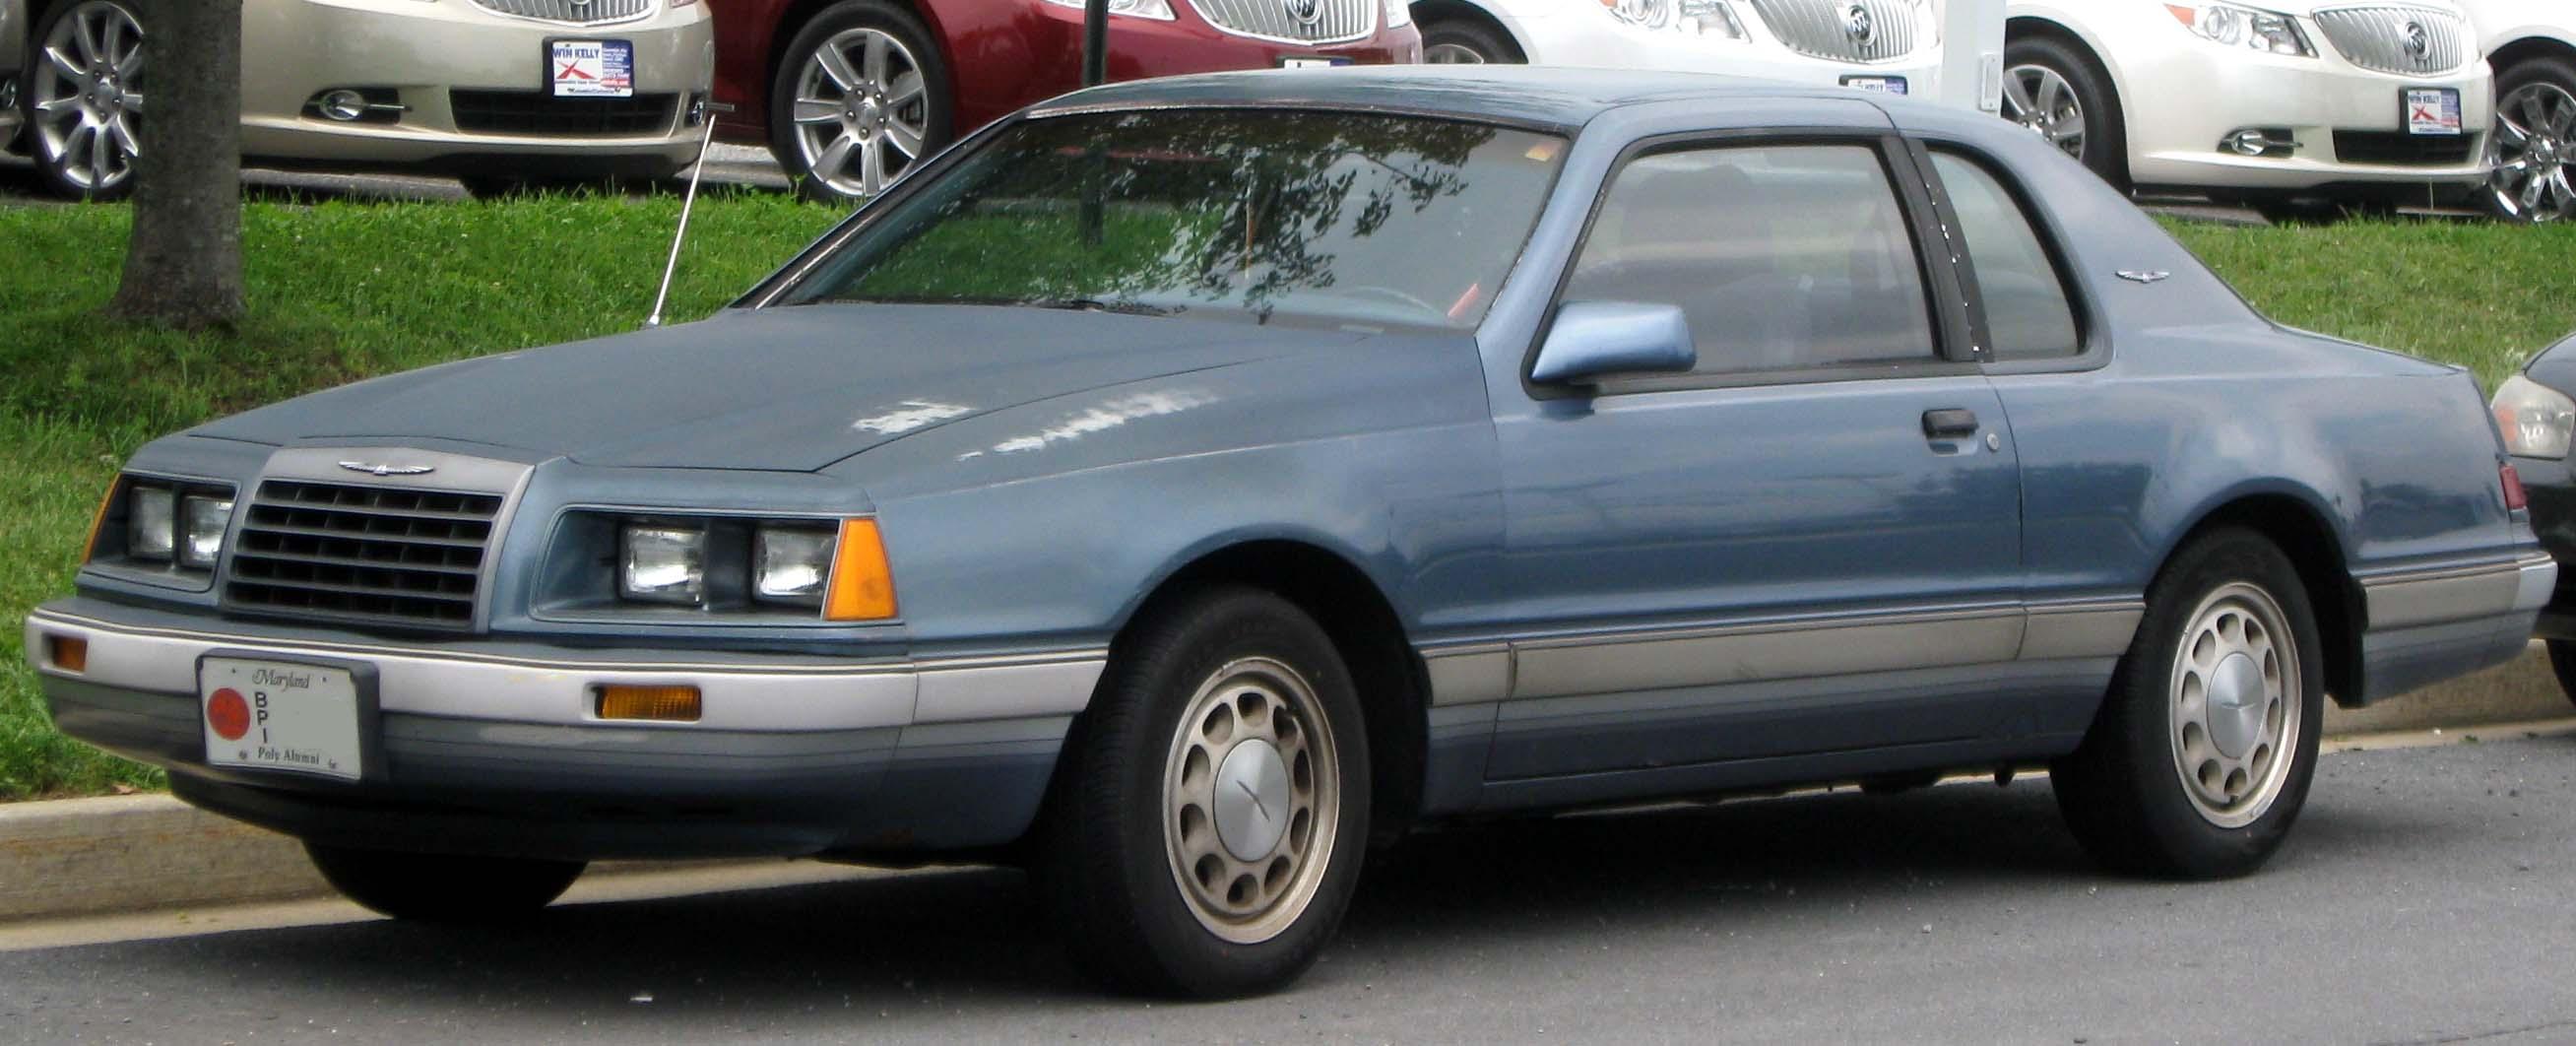 Ford Thunderbird Ninth Generation